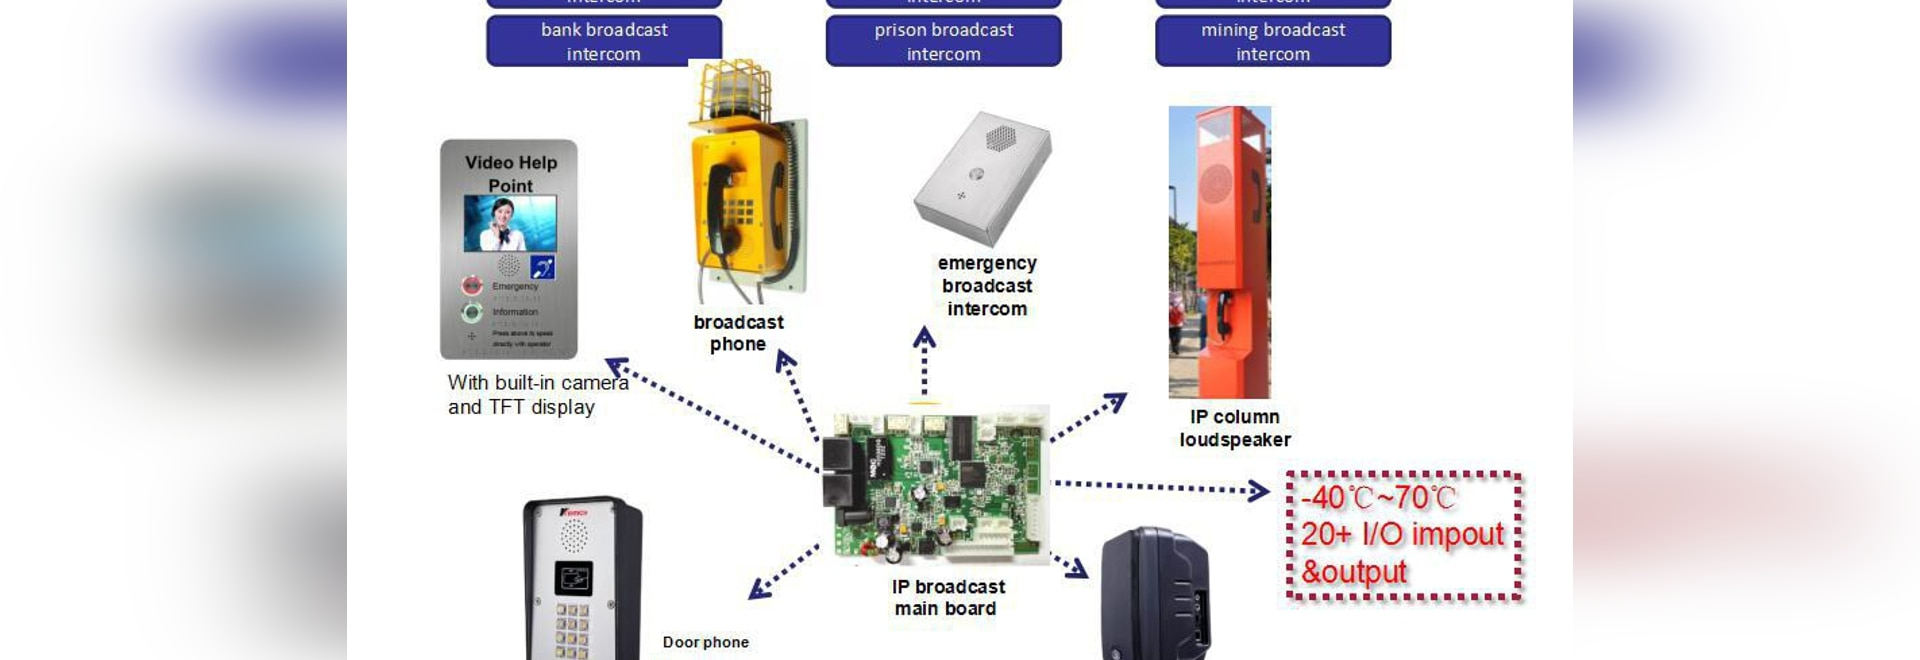 Industrial control IP main board